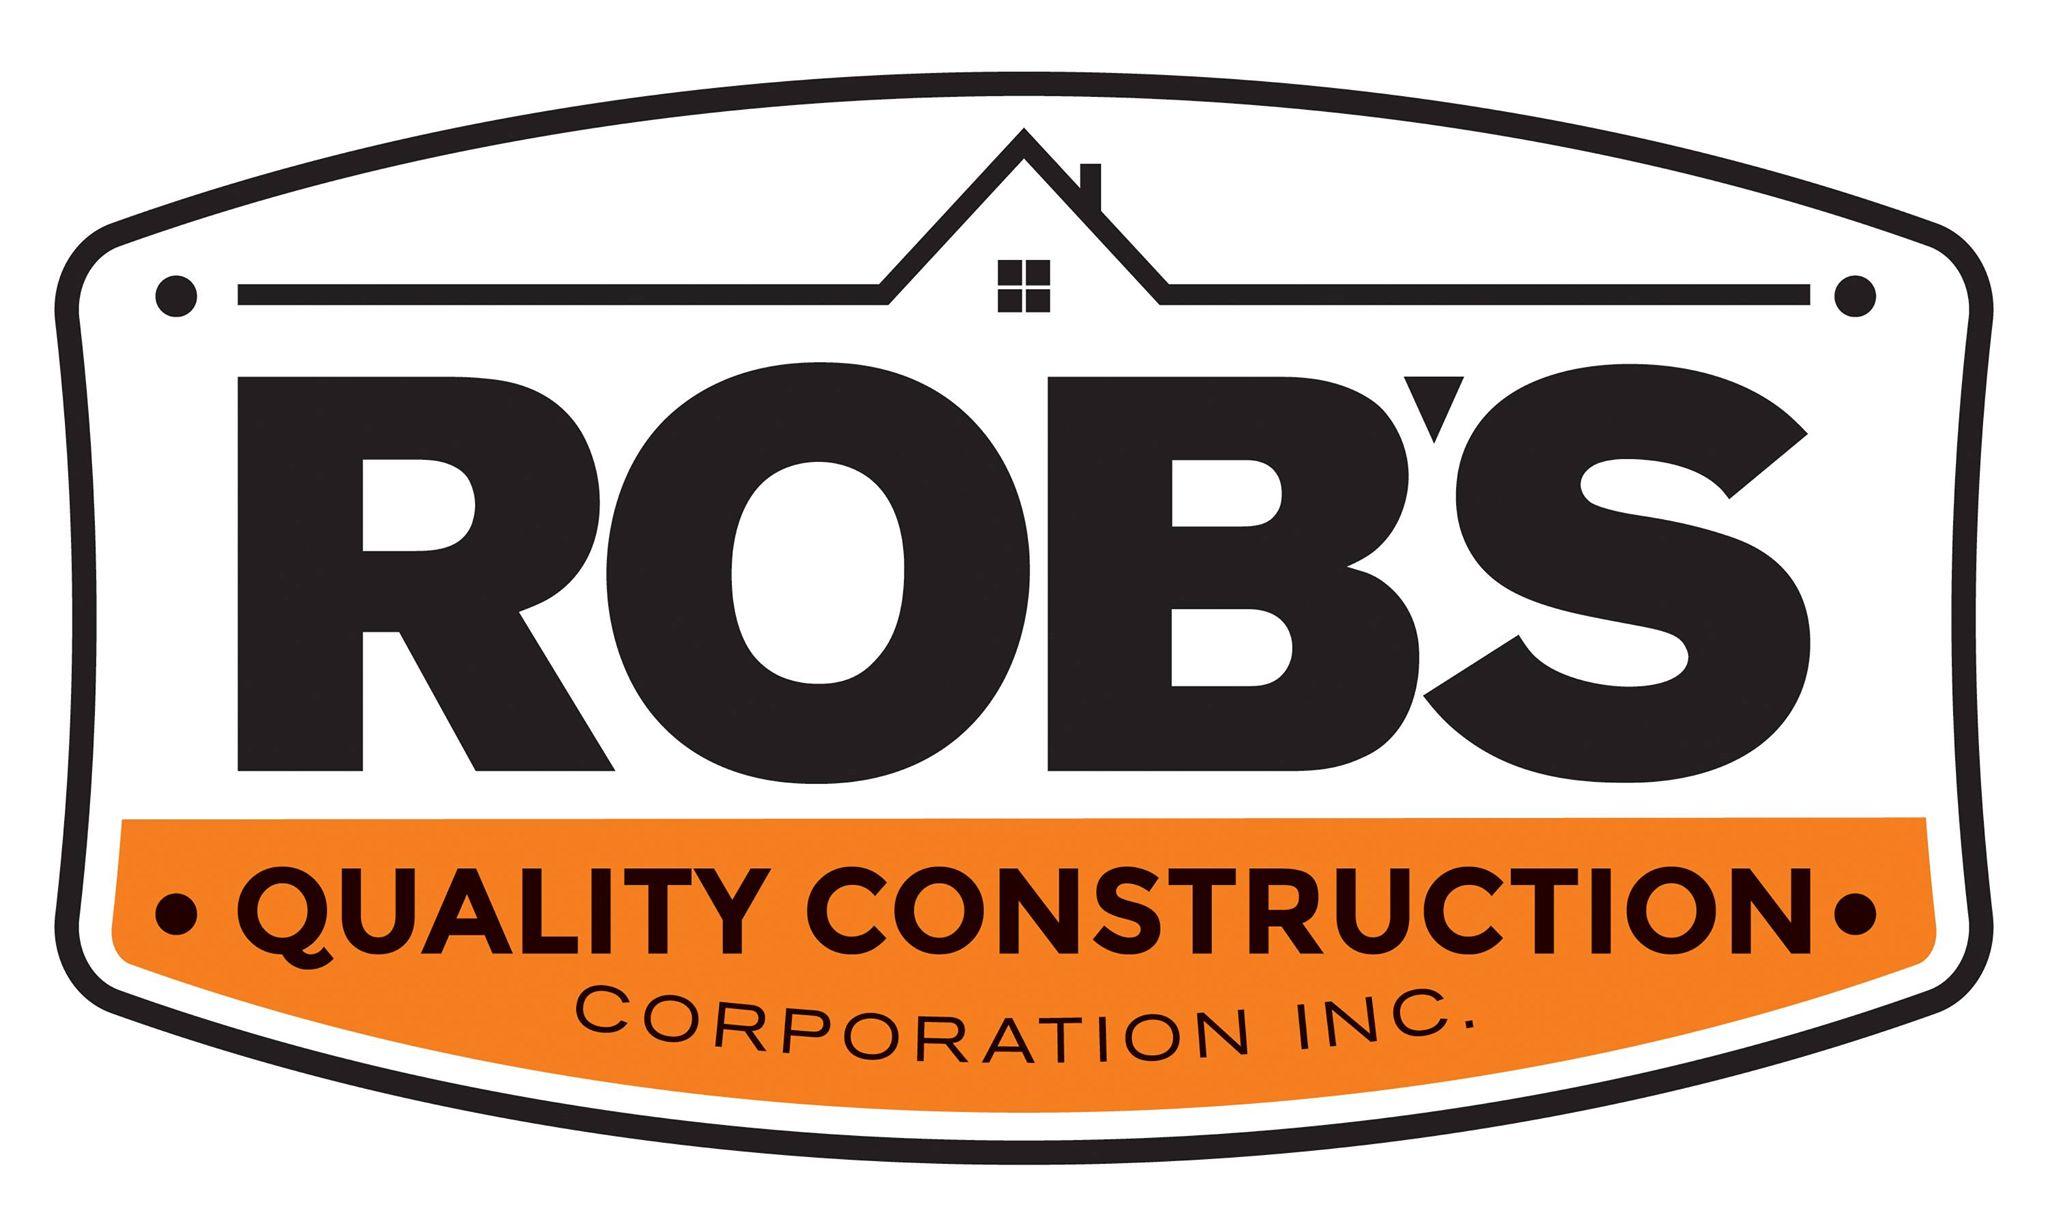 Rob's Quality Construction Corporation Inc